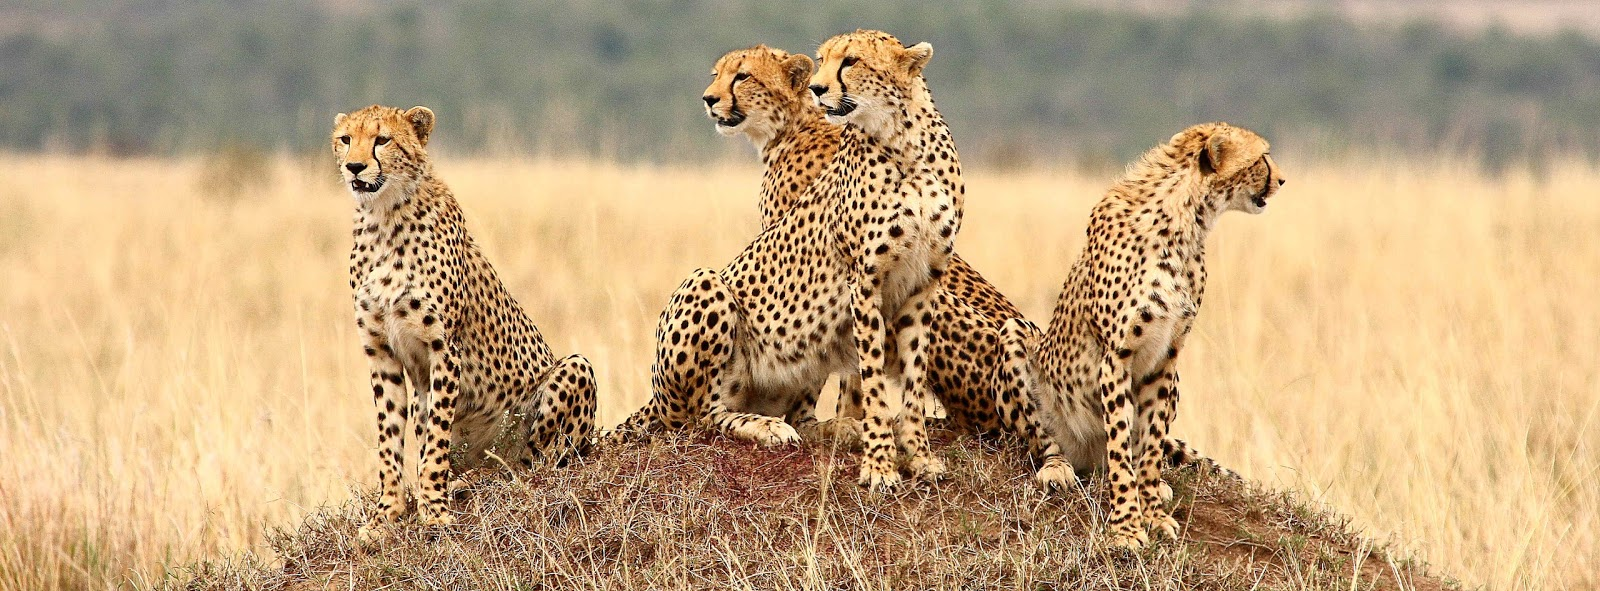 Reserva Nacional Masai Mara (1ª parte)